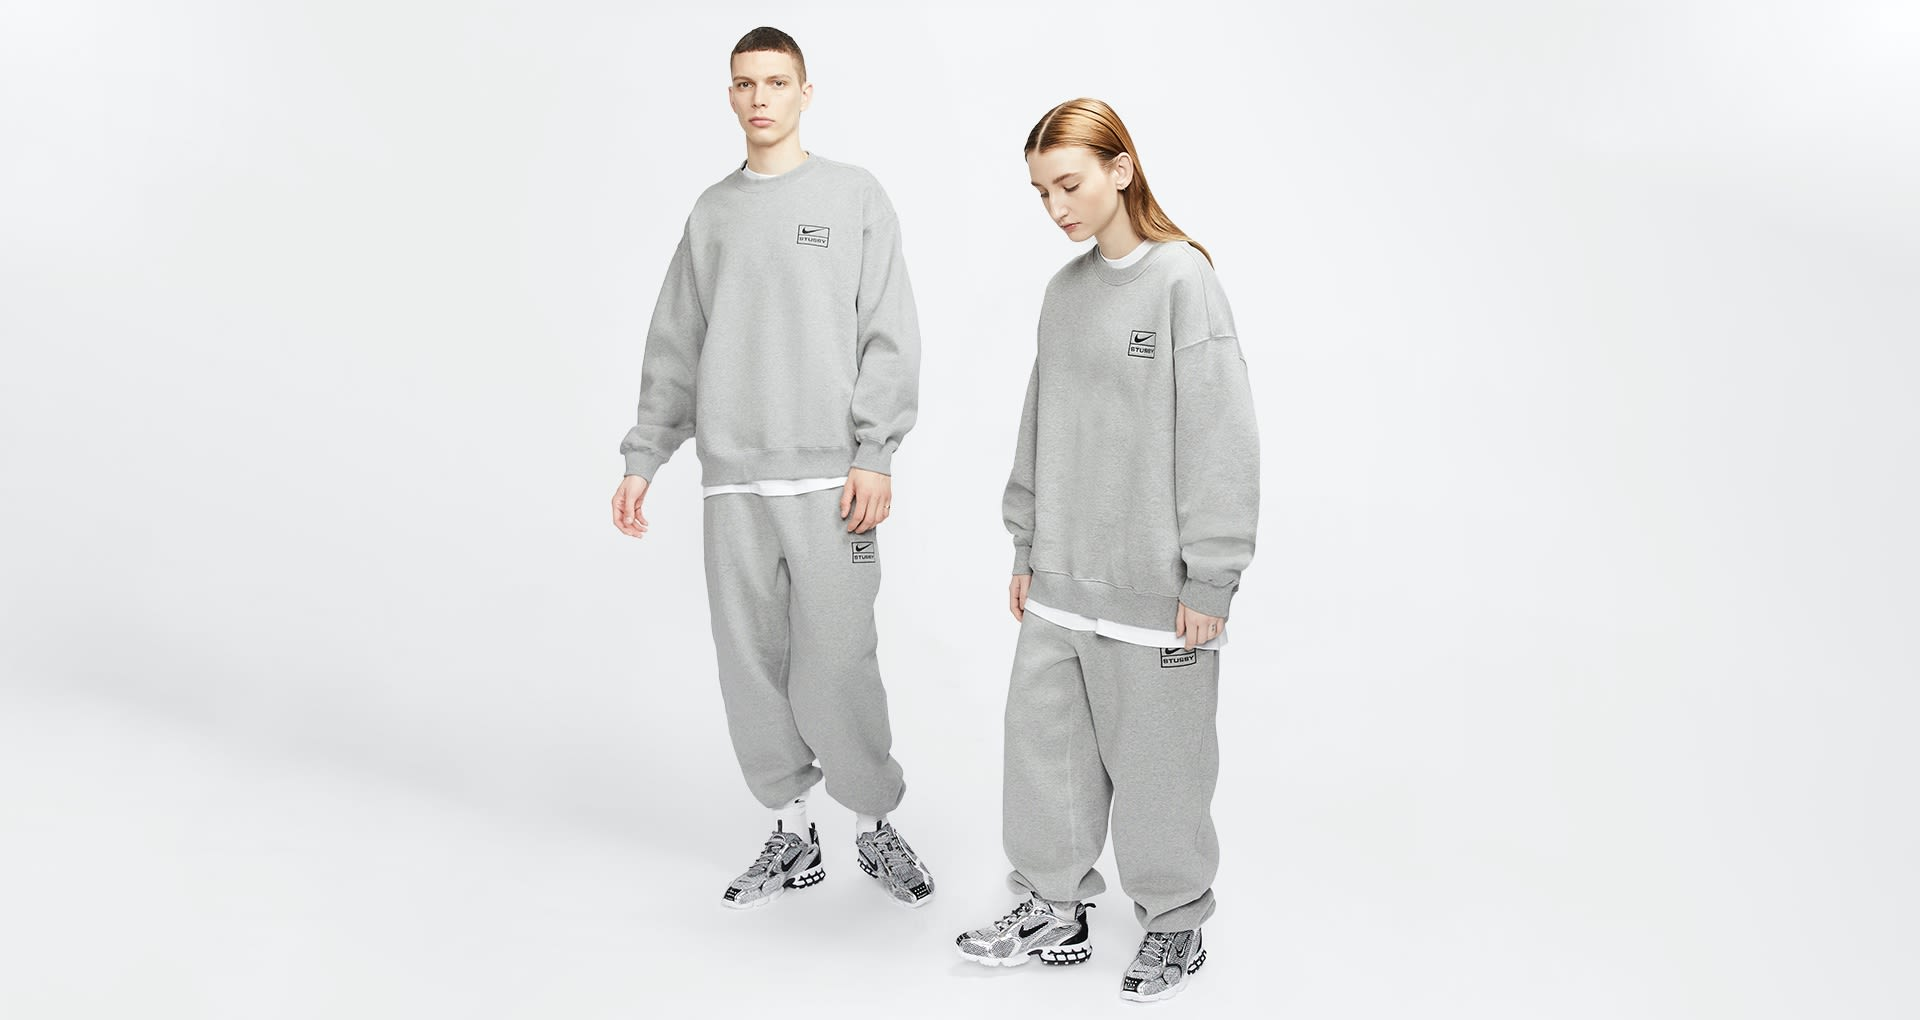 stussy,Nike,CQ5486-200,CU1854-  Stüssy x Nike 聯名即將發售!SNKRS APP 搶先上架多款服飾!